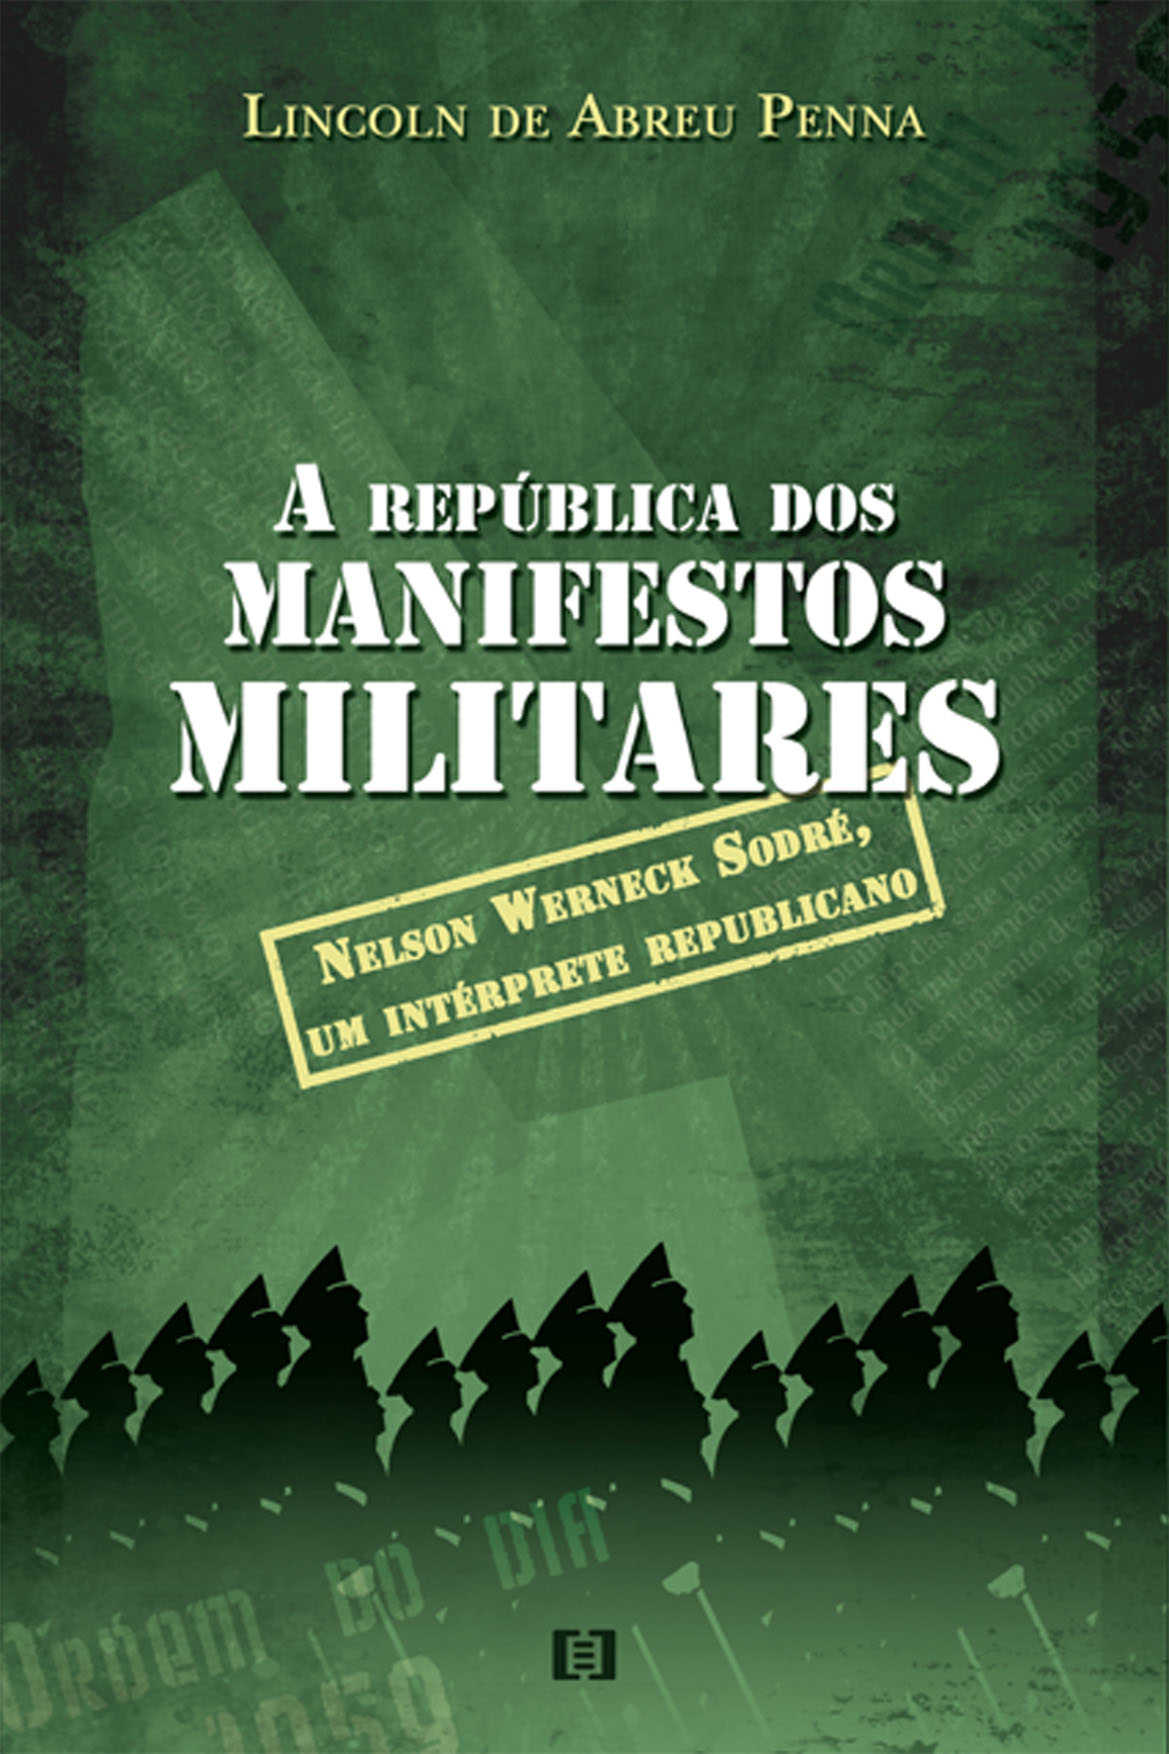 A república dos manifestos militares: Nelson Werneck Sodré, um intérprete republicano